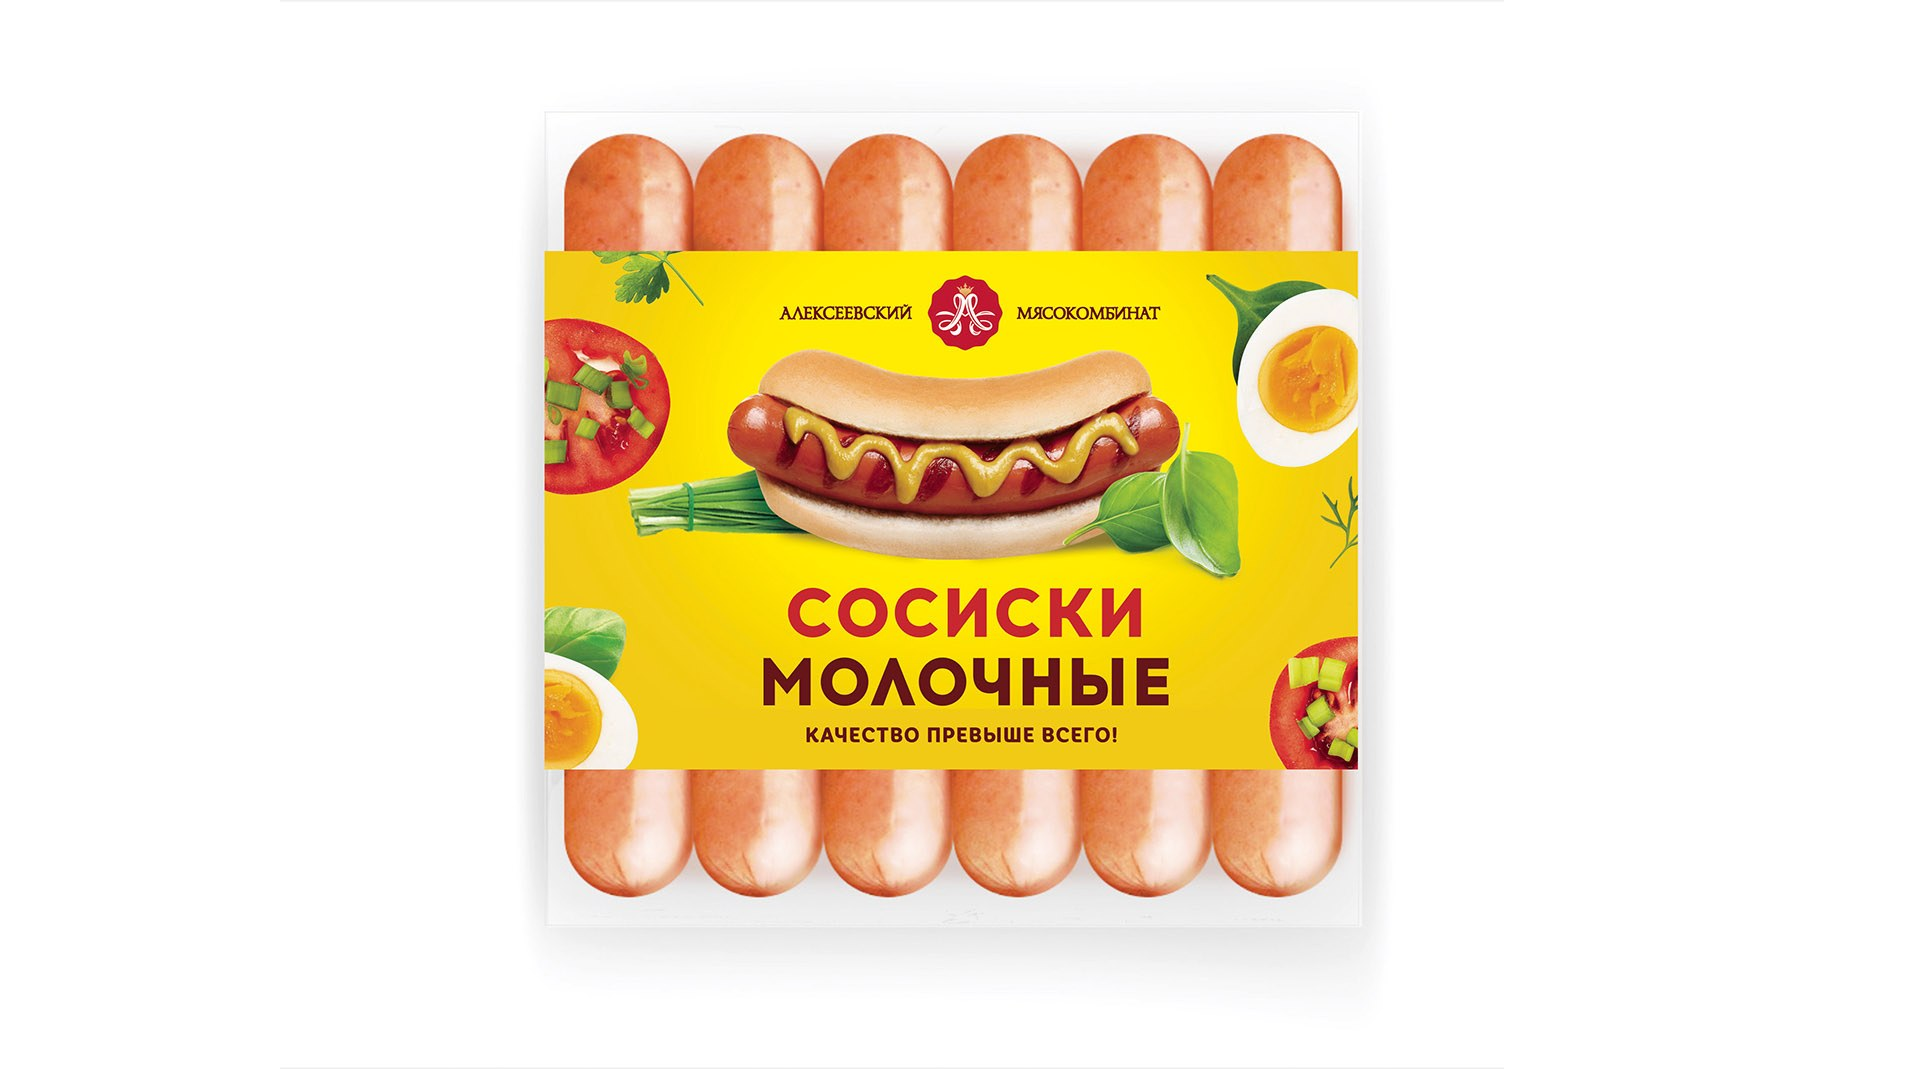 Design of sausage packaging